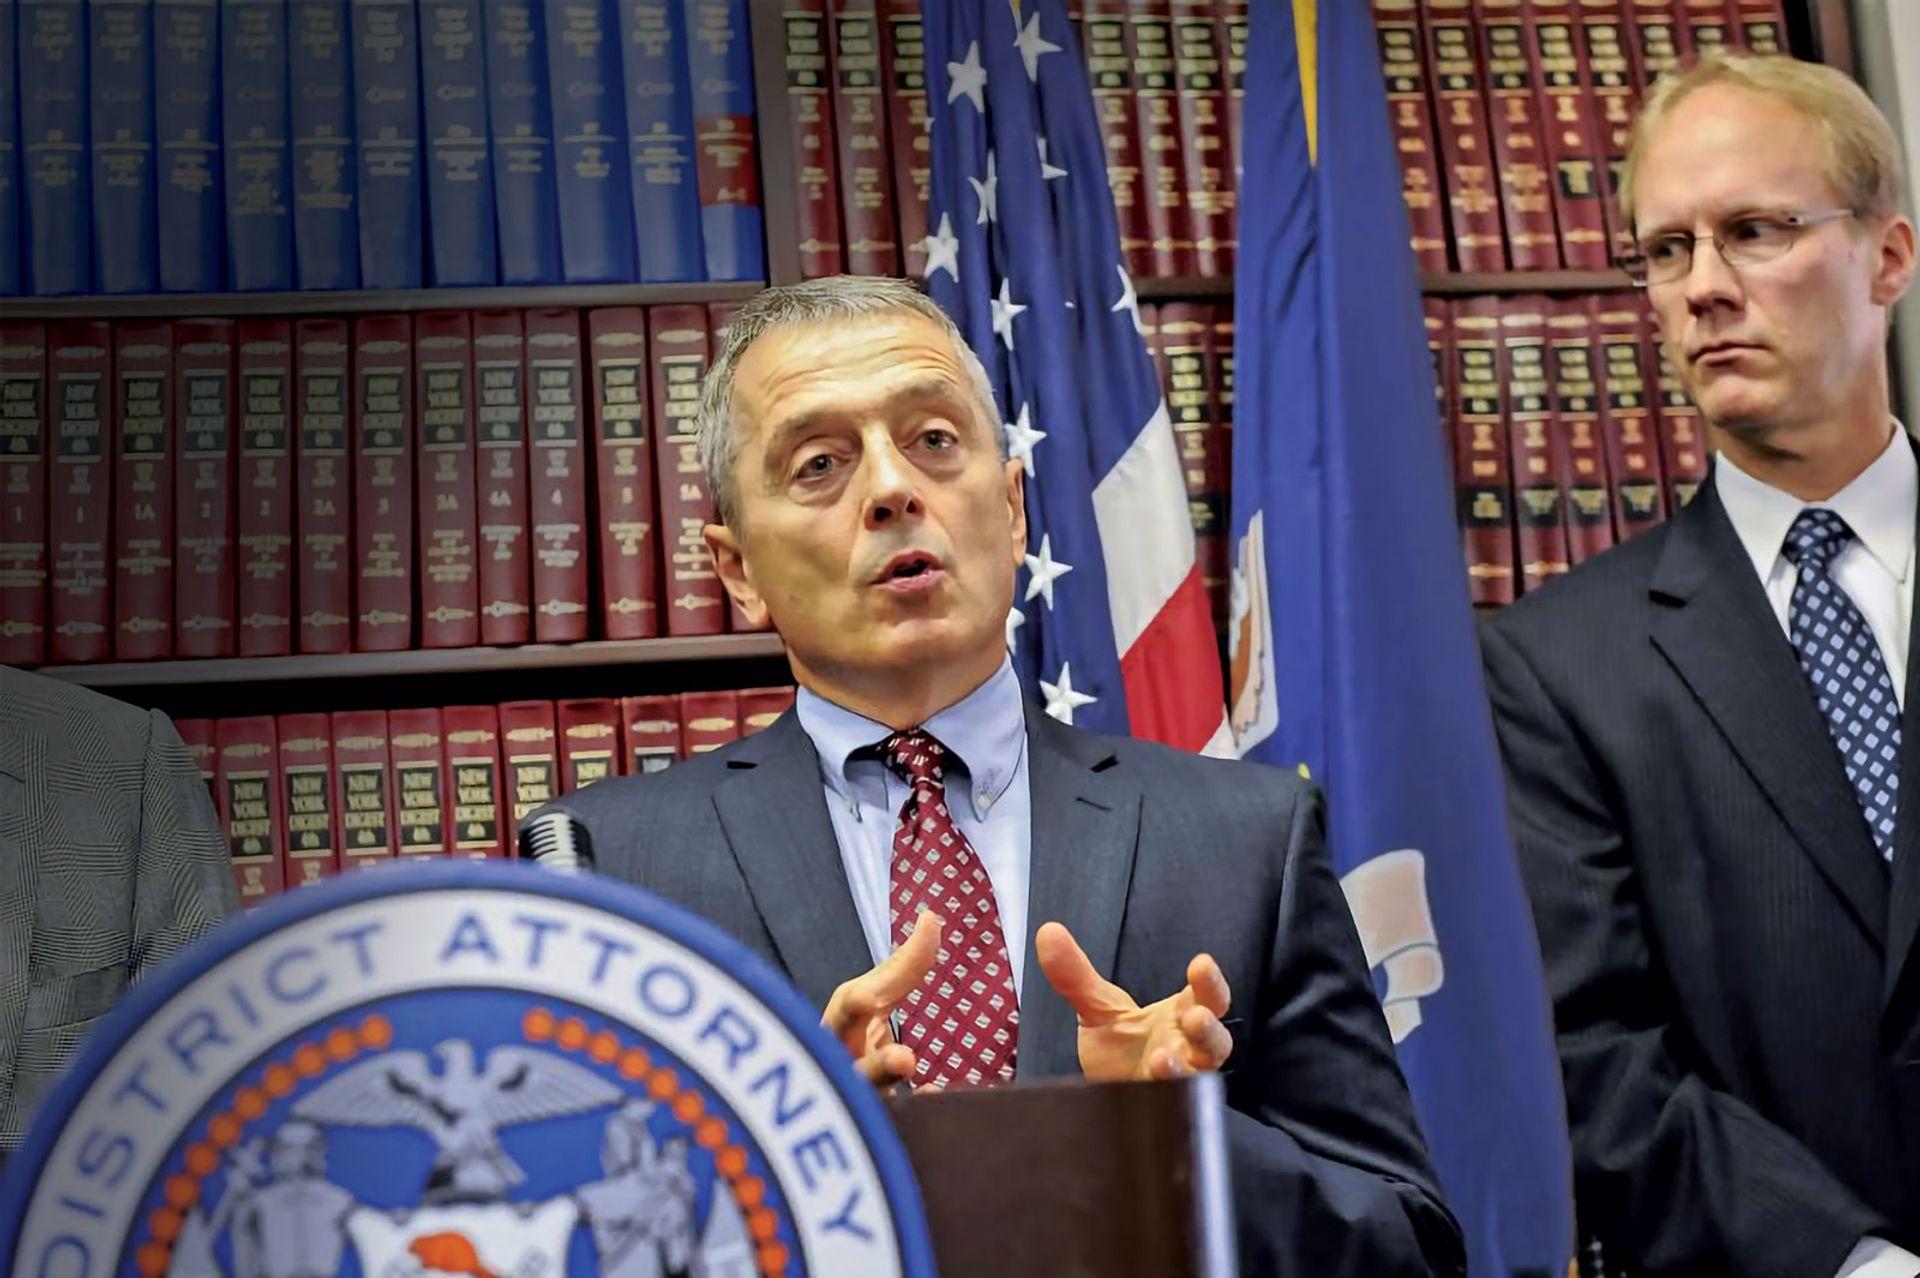 Matthew Bogdanos is investigating up to 40 suspected trafficking cases Manhatten District Attorney's Office